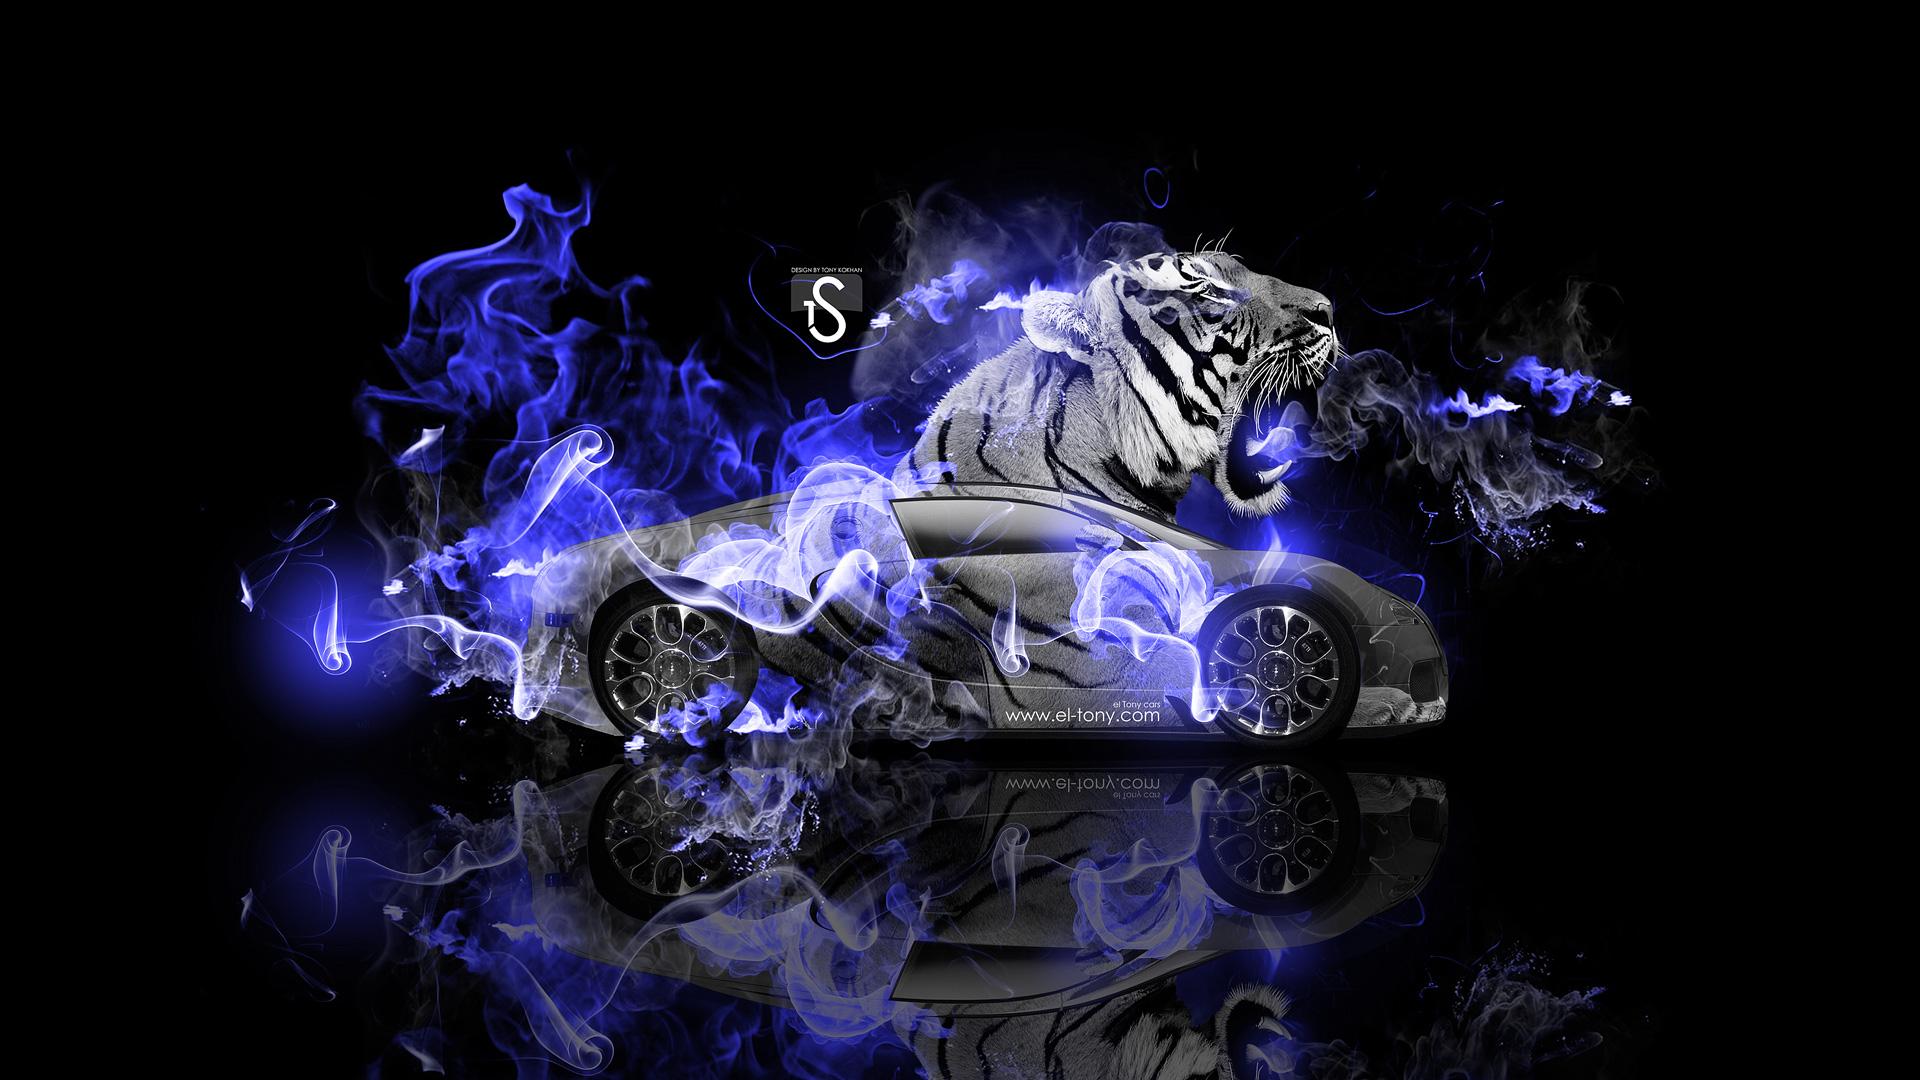 Bugatti Veyron Fantasy Tiger Blue Fire Car 2014 HD Wallpapers Design ...